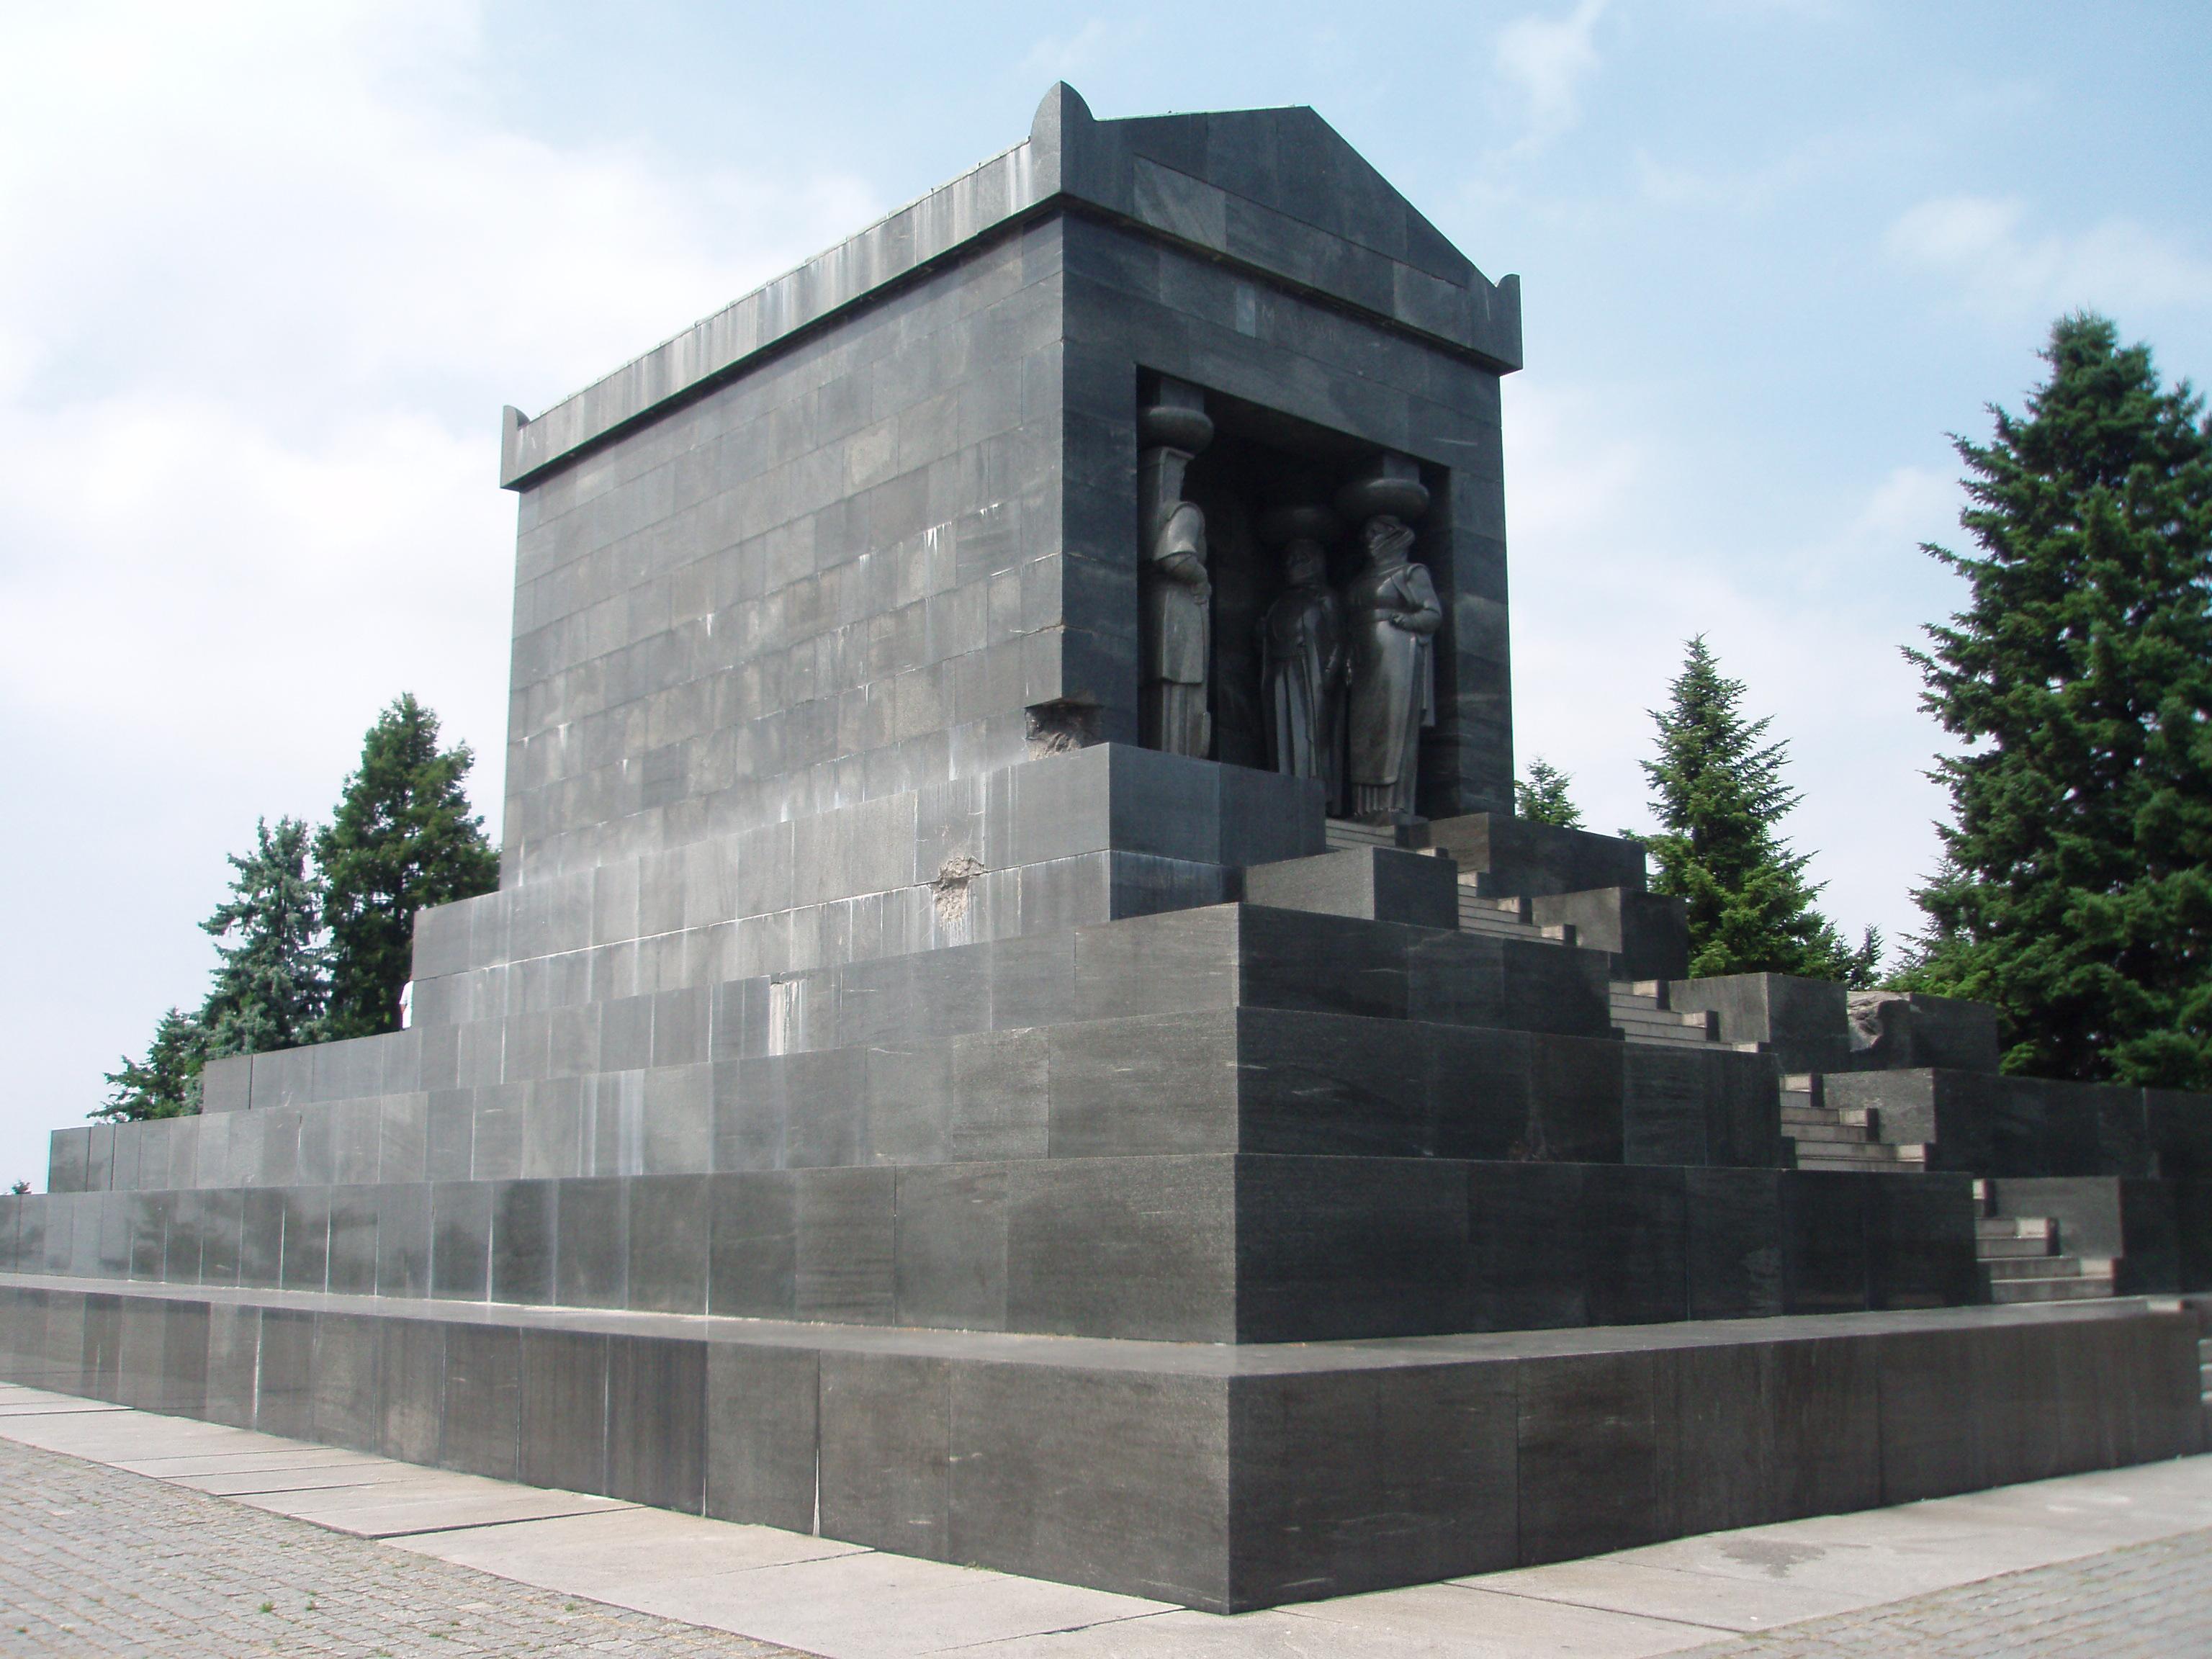 File Spomenik Neznanom Junaku Panoramio Jpg Wikimedia Commons